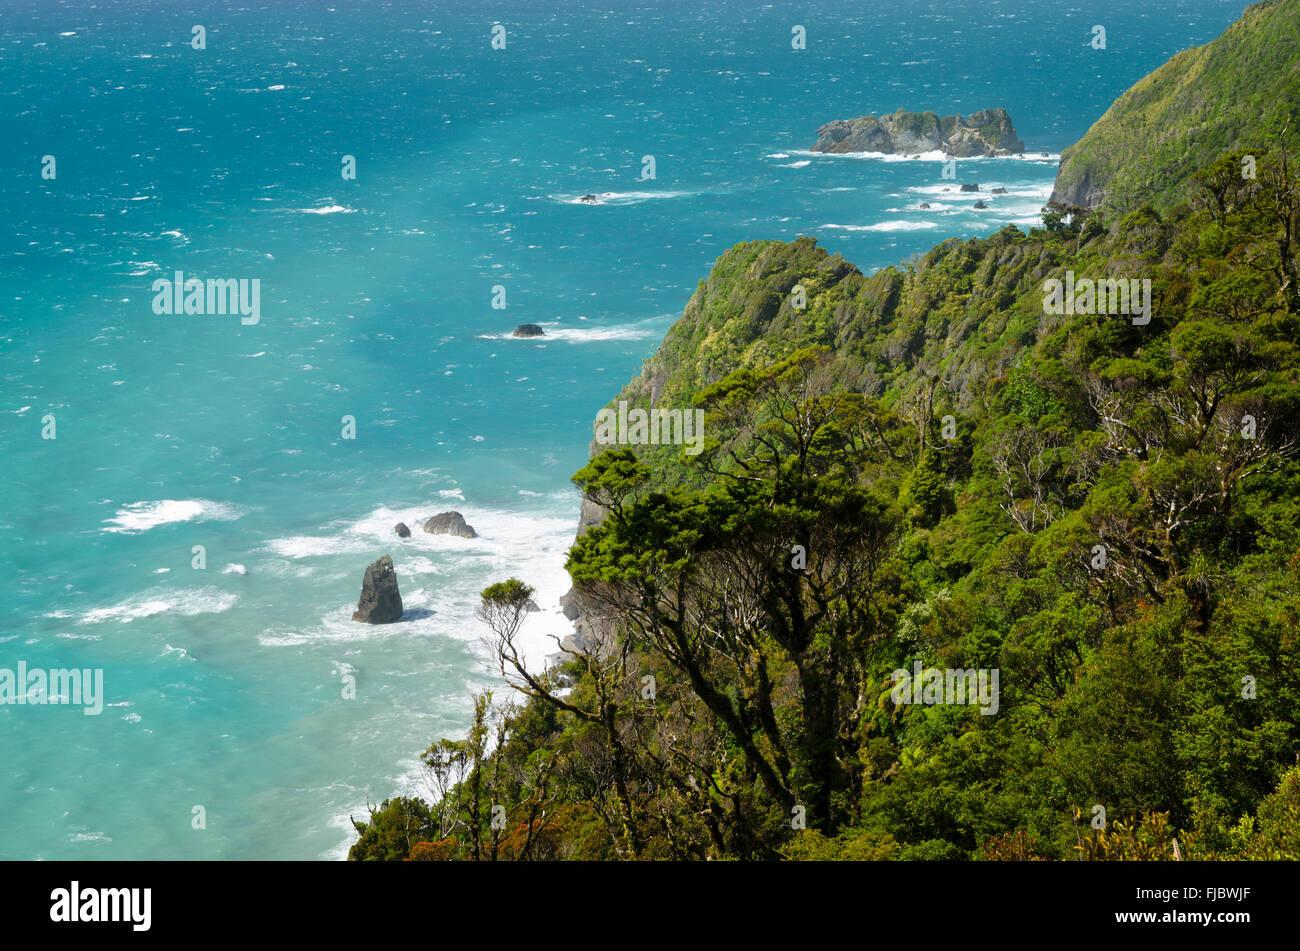 Wild coast with surf, rain forest with dense vegetation, turquoise sea, West Coast, South Island, New Zealand - Stock Image